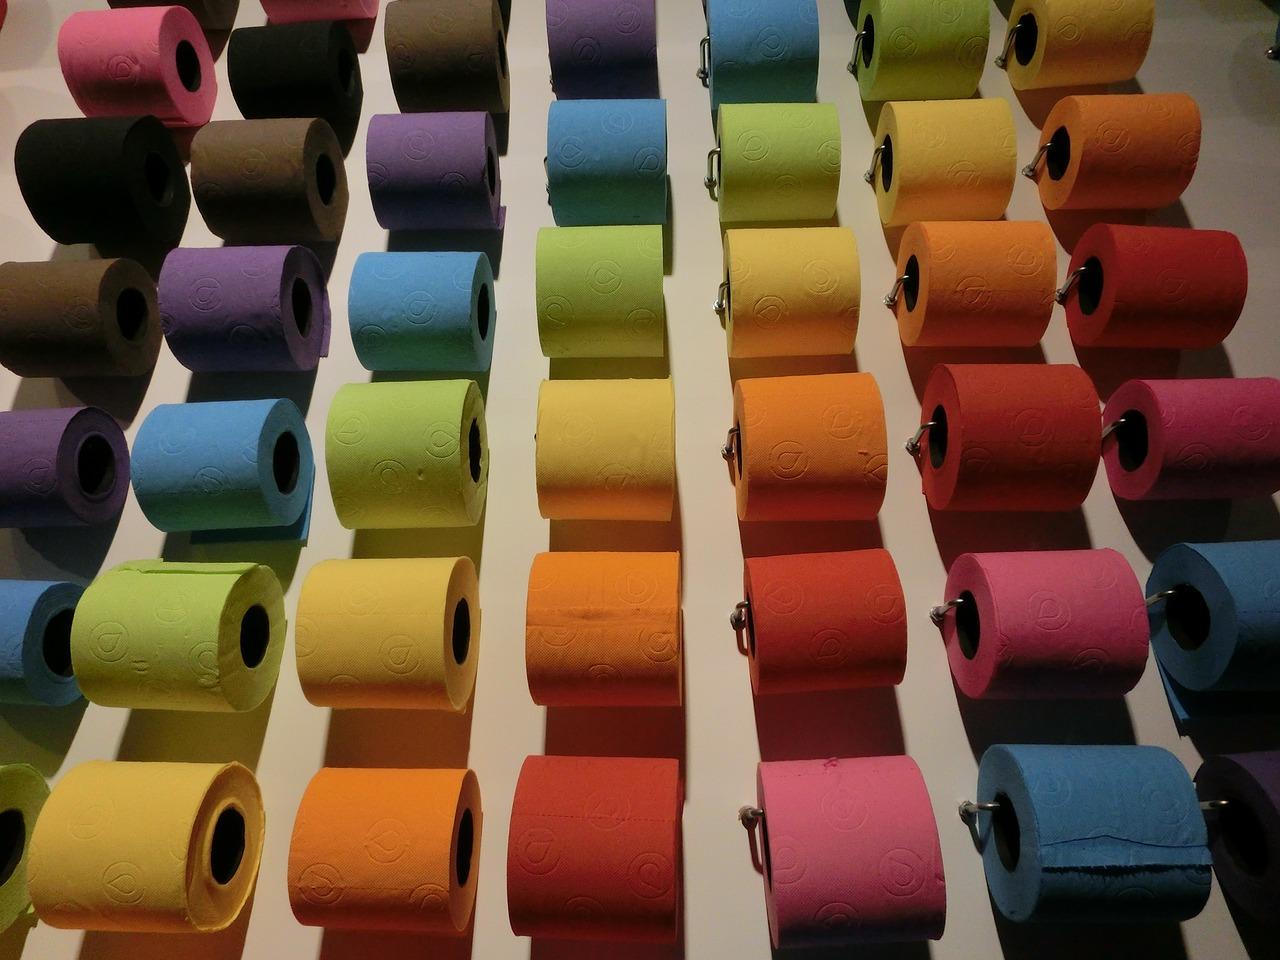 toilet-paper-1230149_1280